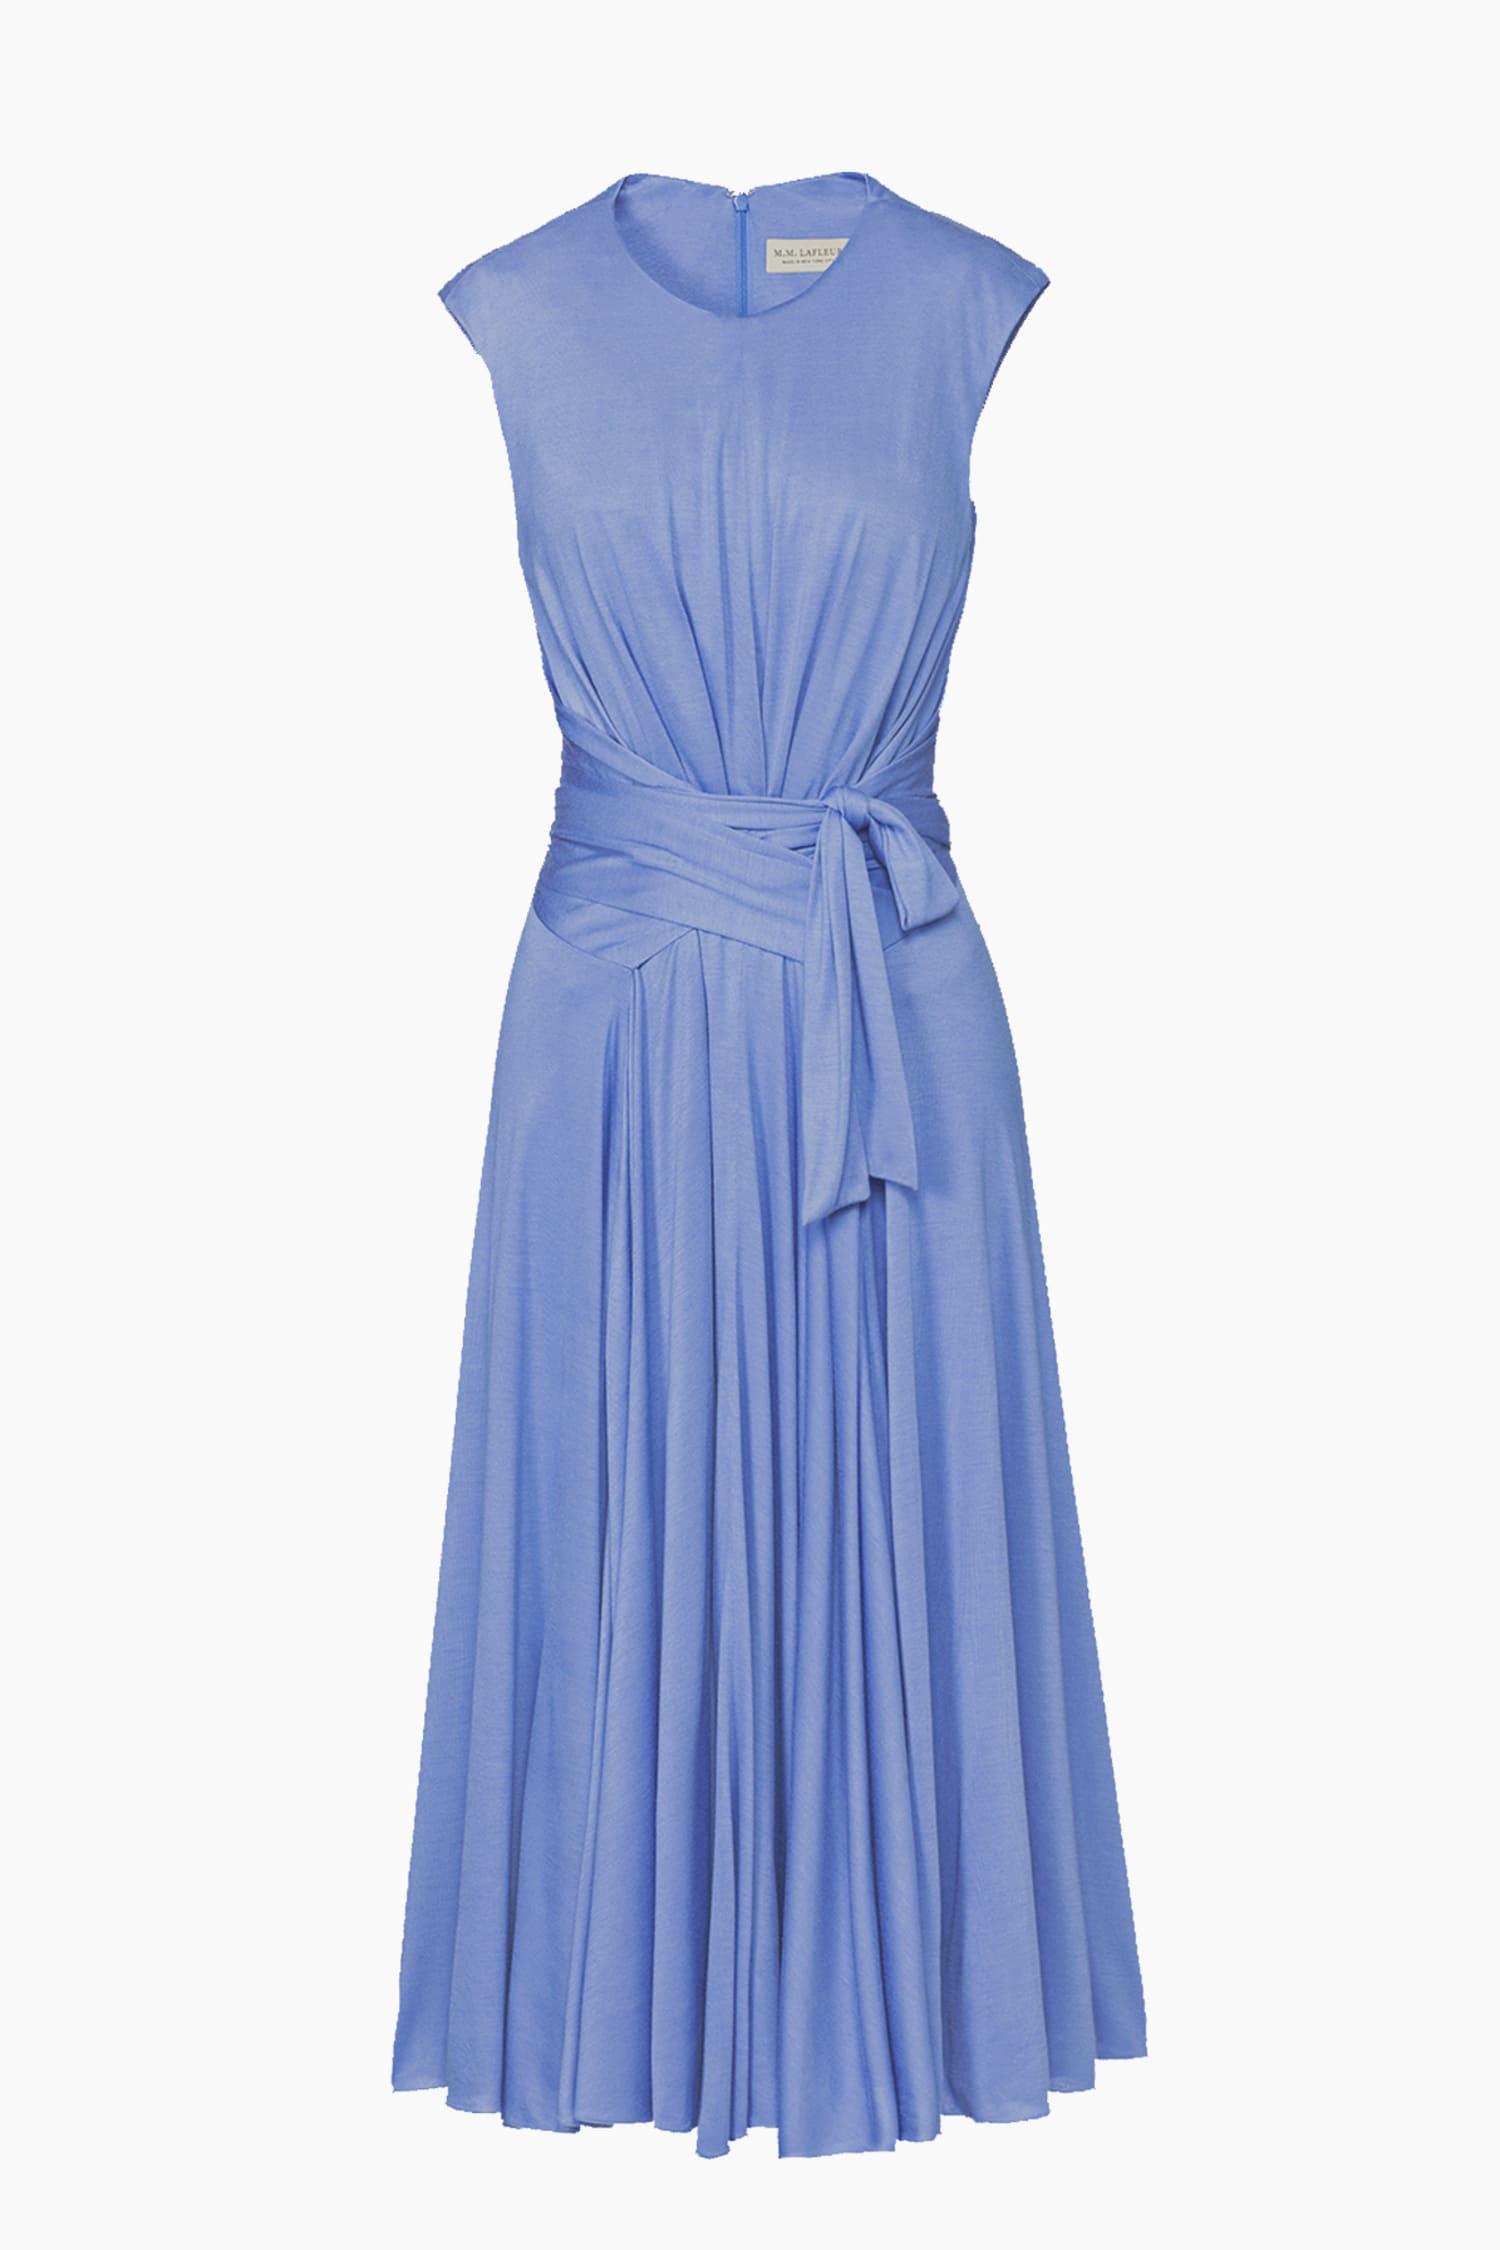 New Lipsy Lace Cold Shoulder Cornflower Blue Dress Sz UK 8 /& 16